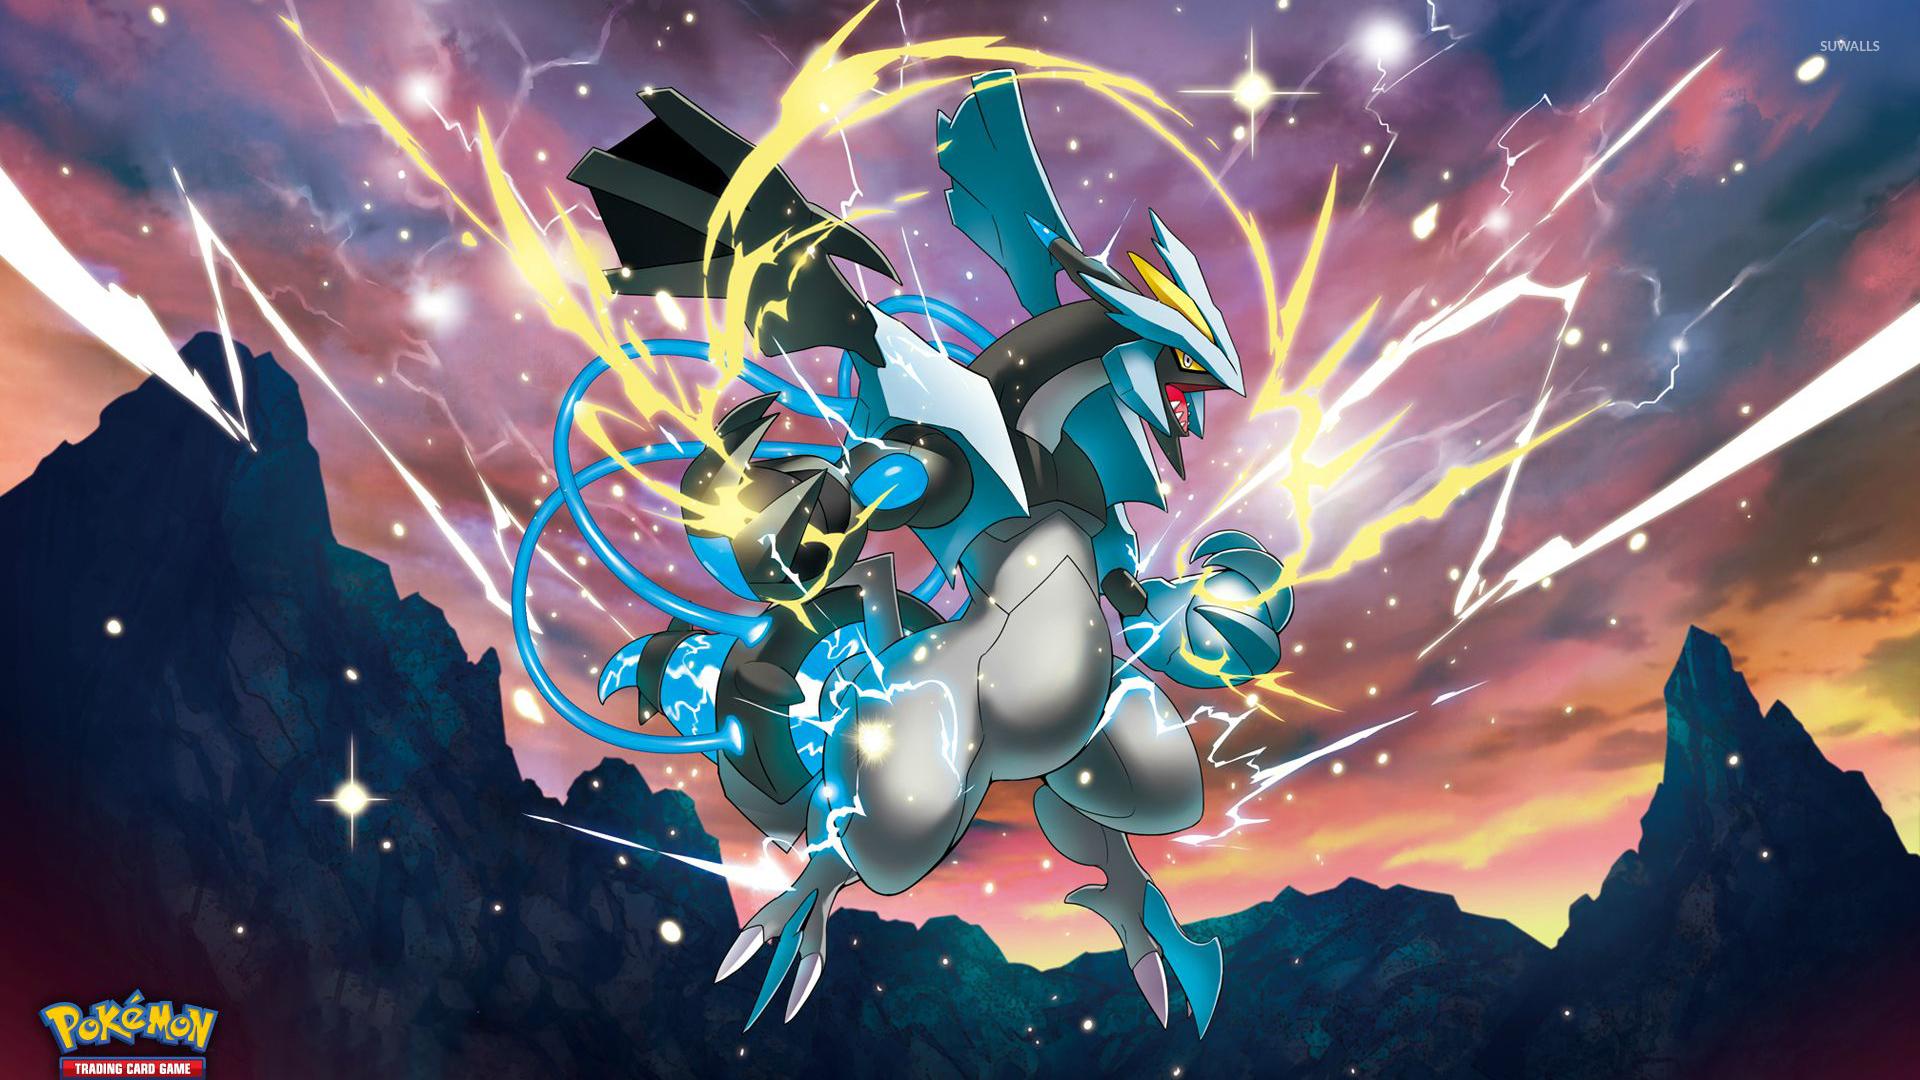 Charizard casting a spell - Pokemon